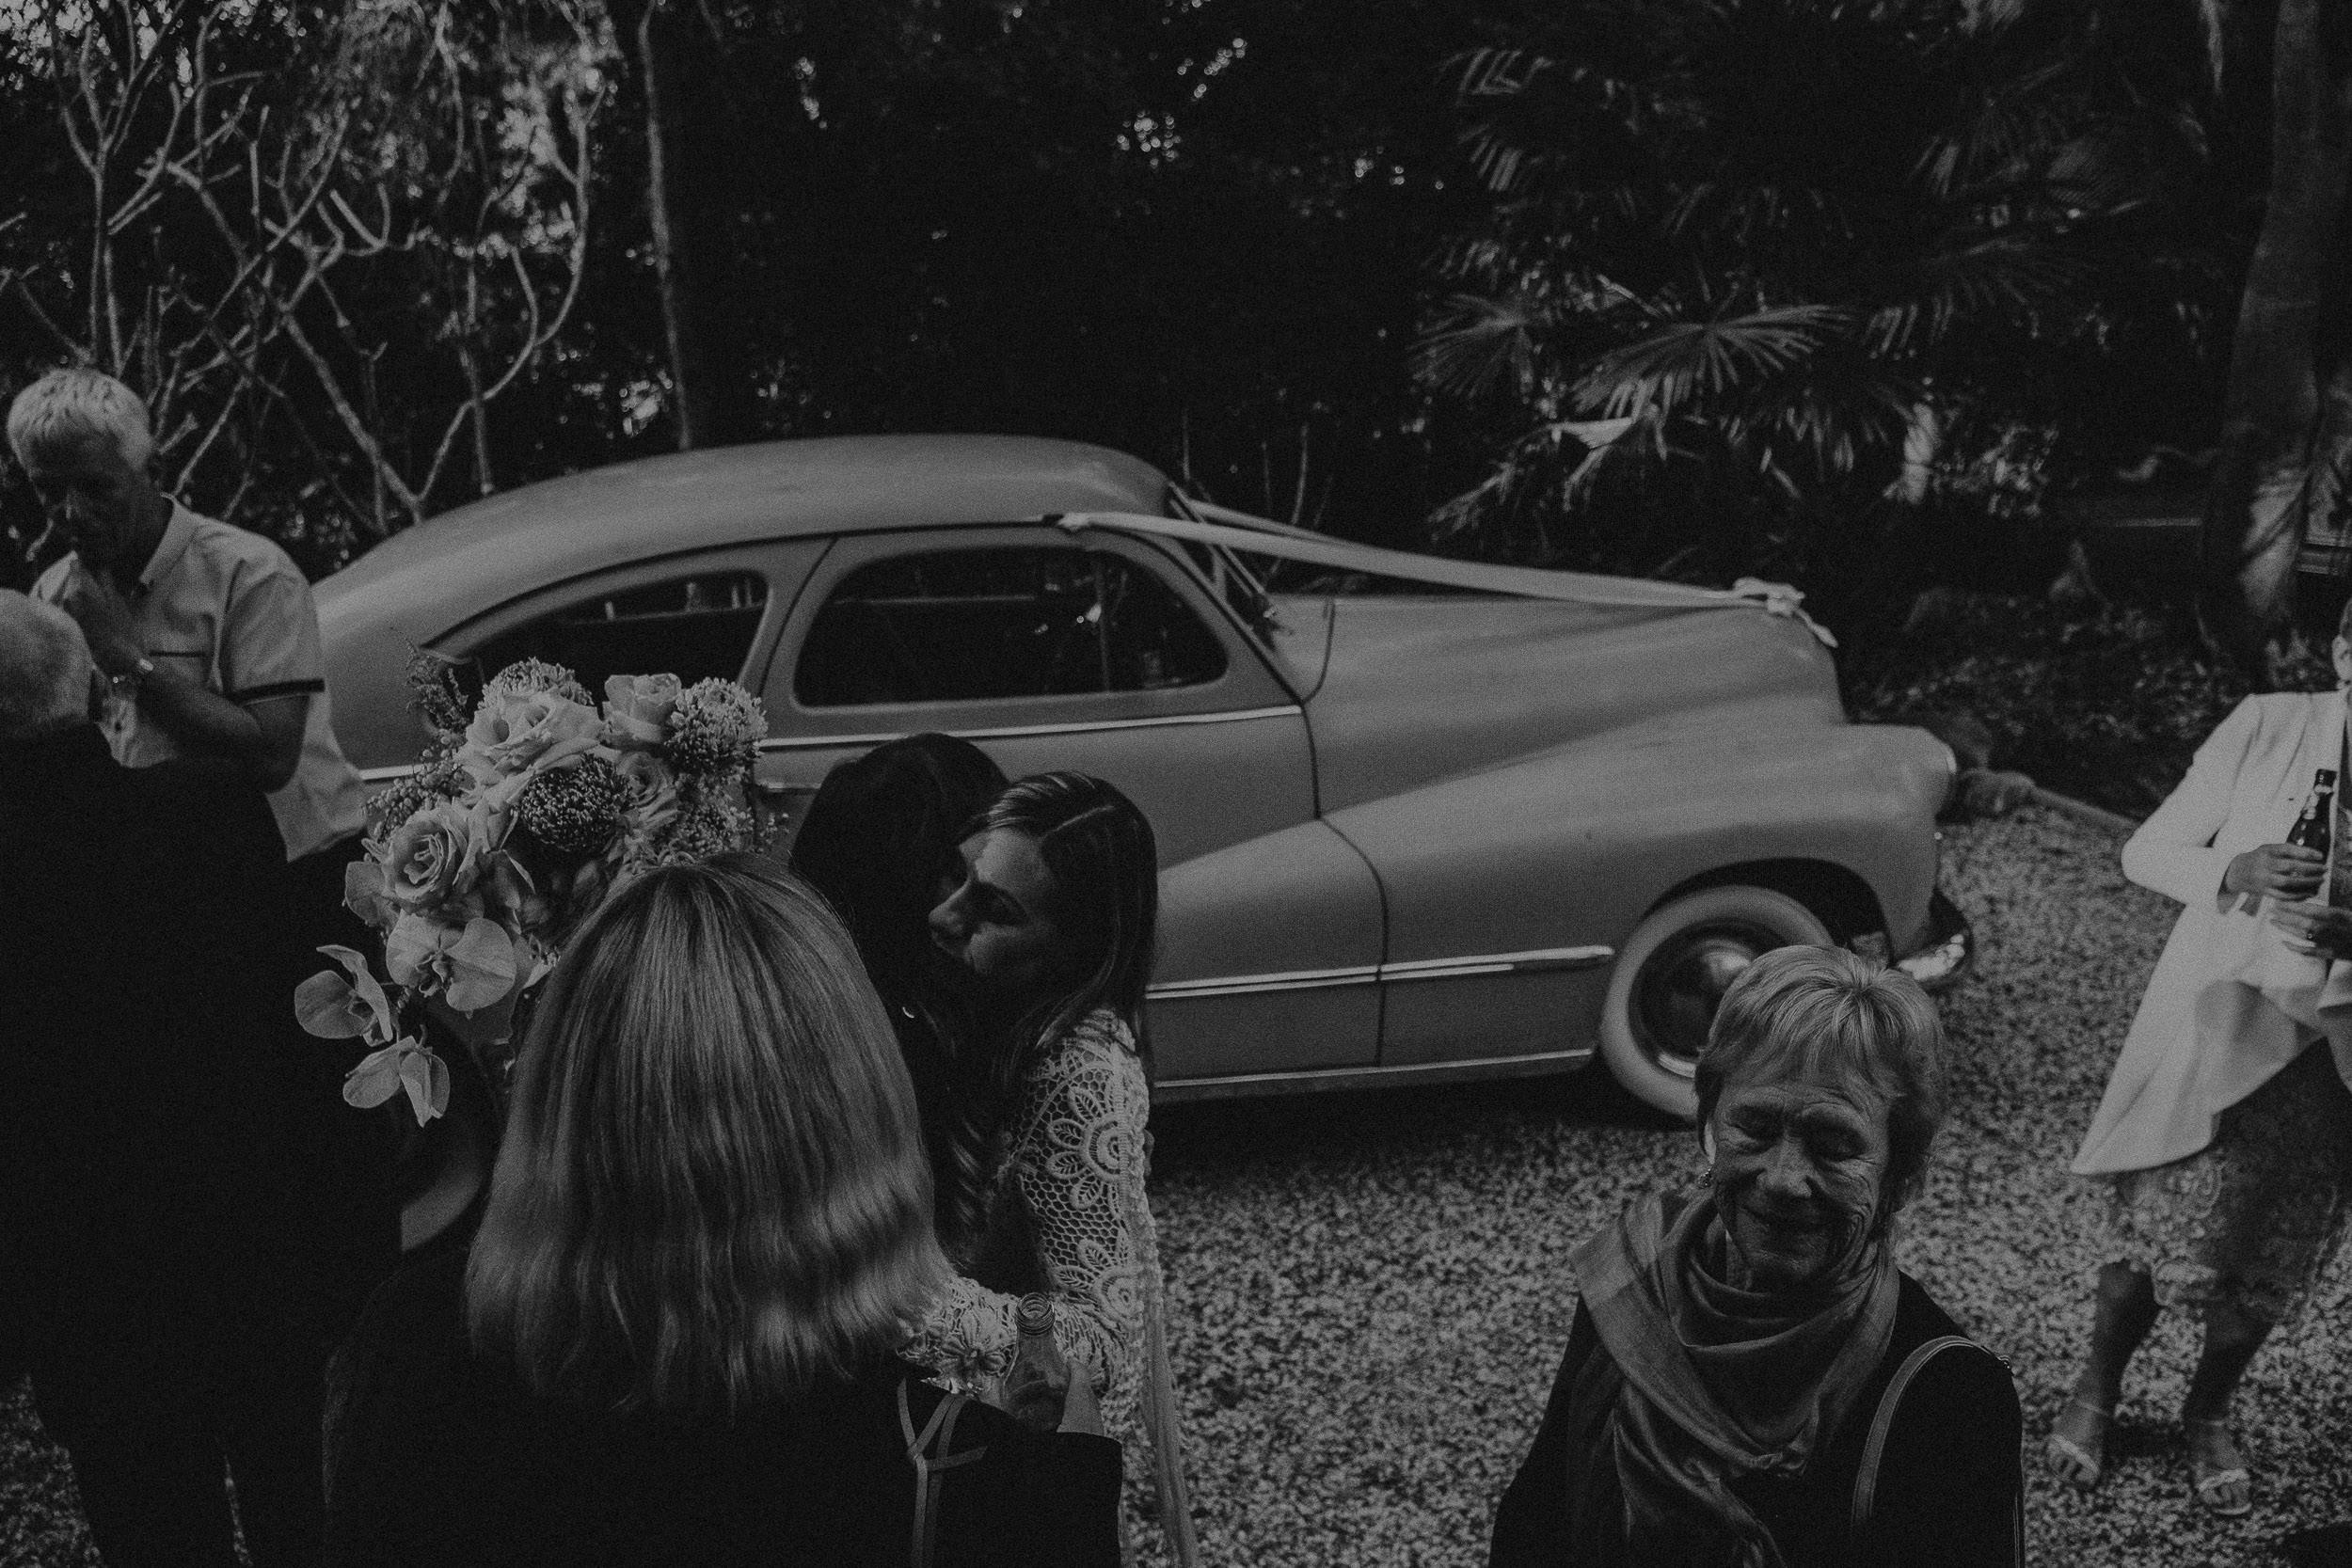 S&A Elopement - Kings & Thieves - Shred 'Til Dead - Central Coast Beach Forest Wedding - 338.jpg